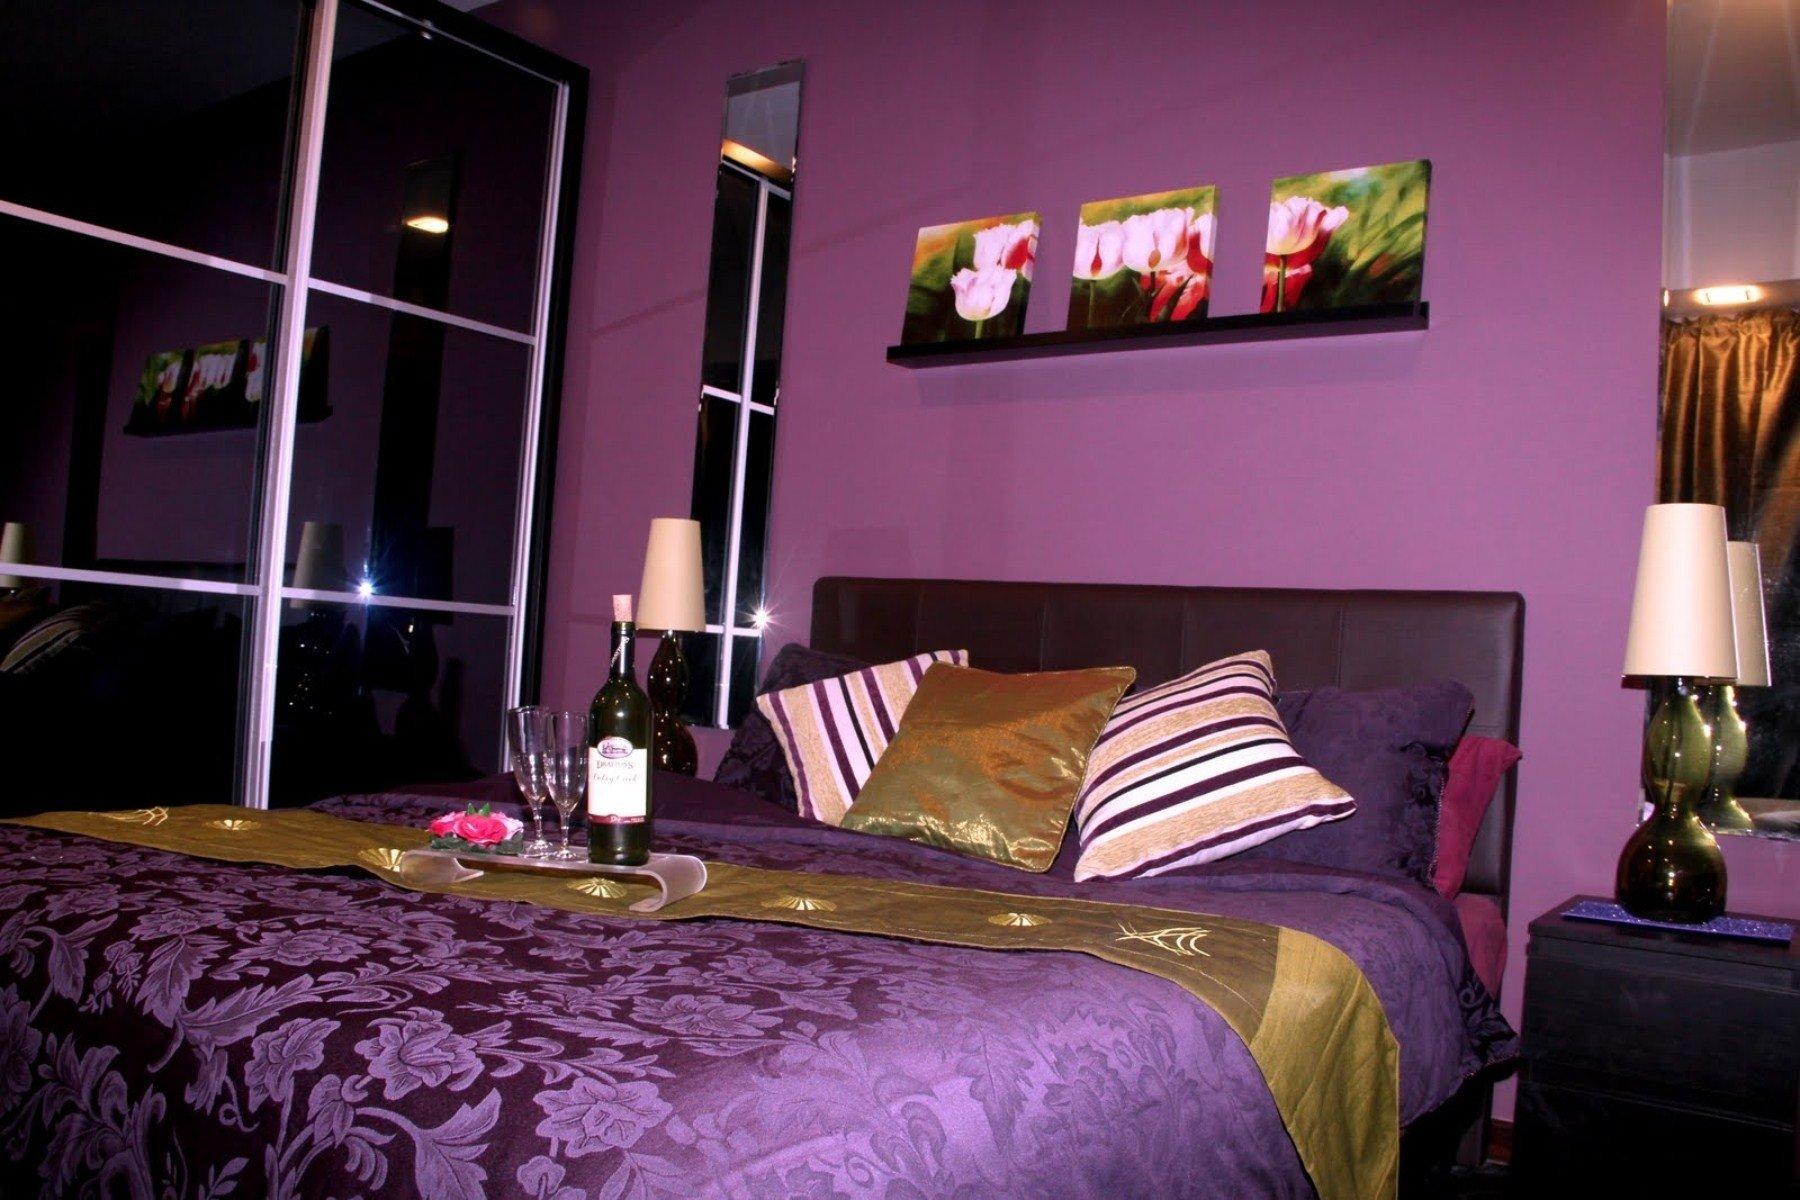 10 Fabulous Purple And Black Bedroom Ideas bedroom romantic purple bedroom ideas for valentine days with black